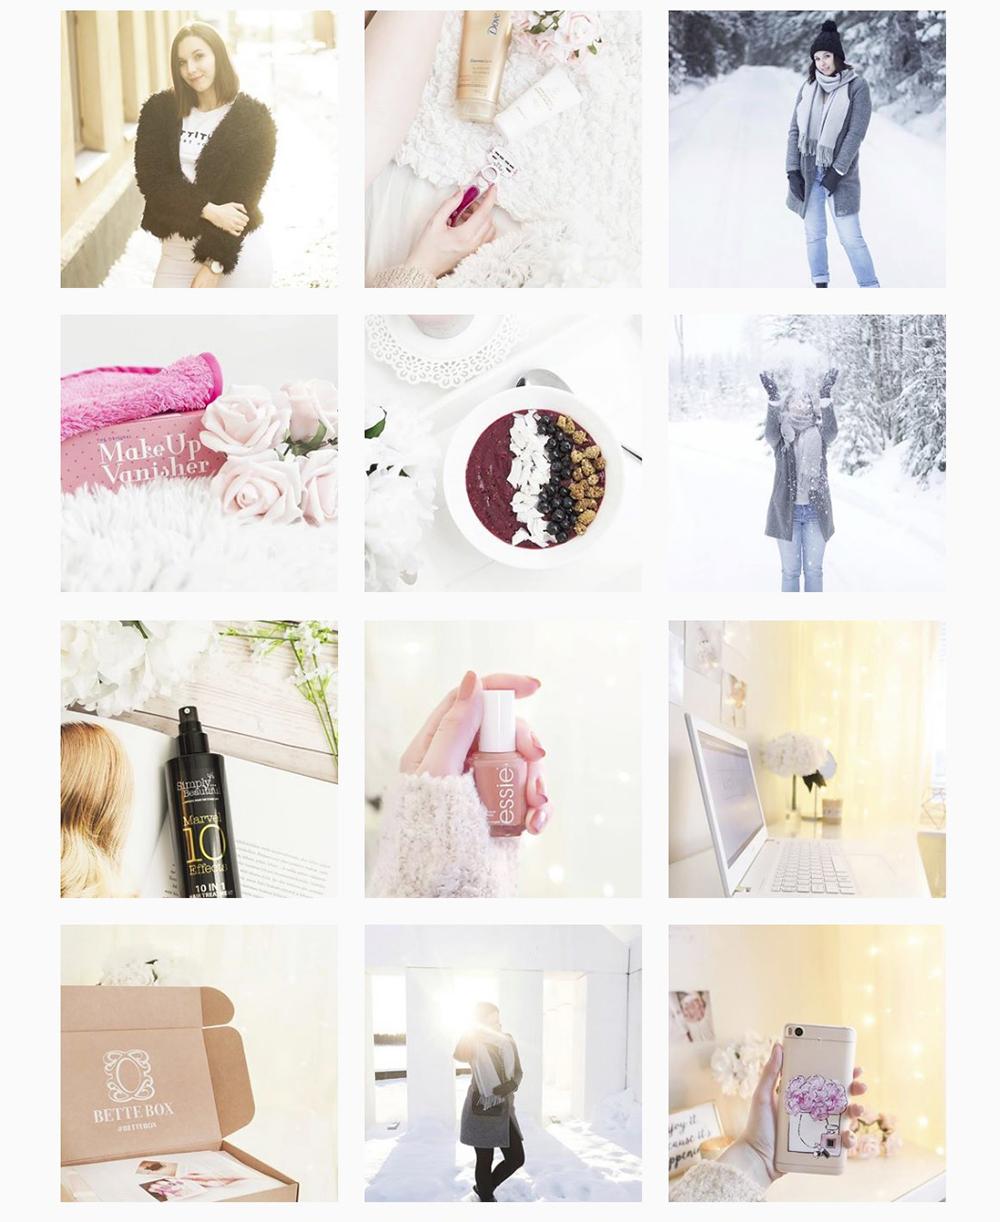 Tammikuun Instagram Feed